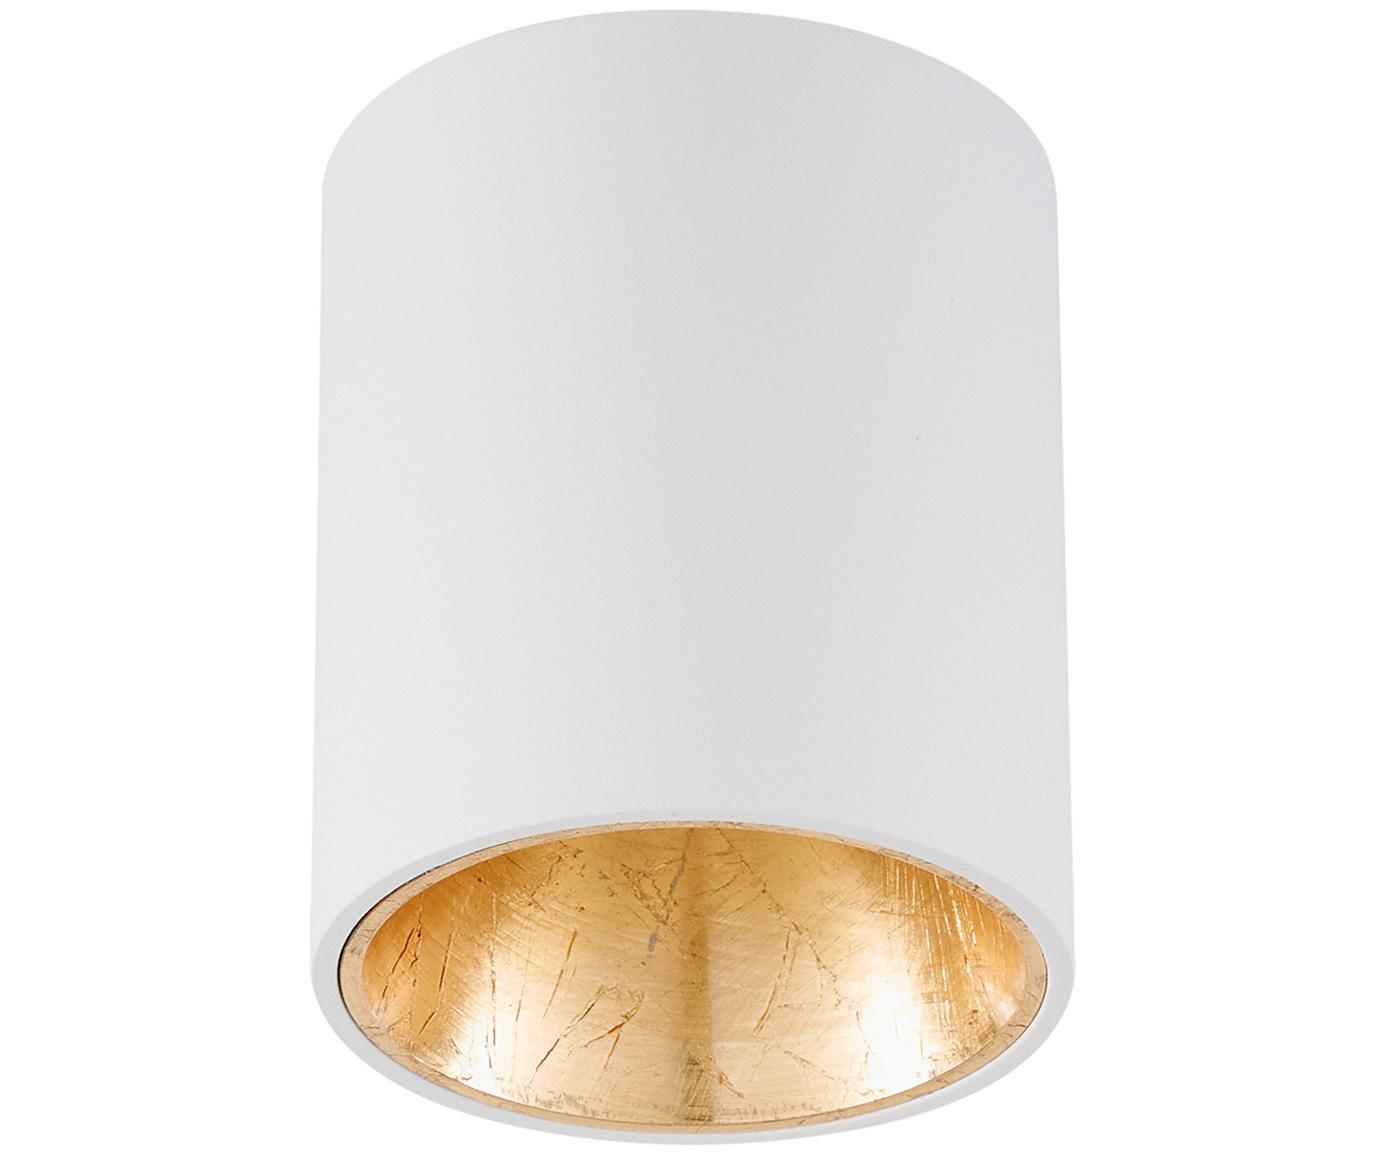 LED Deckenspot Marty, Weiß, Goldfarben, ∅ 10 x H 12 cm